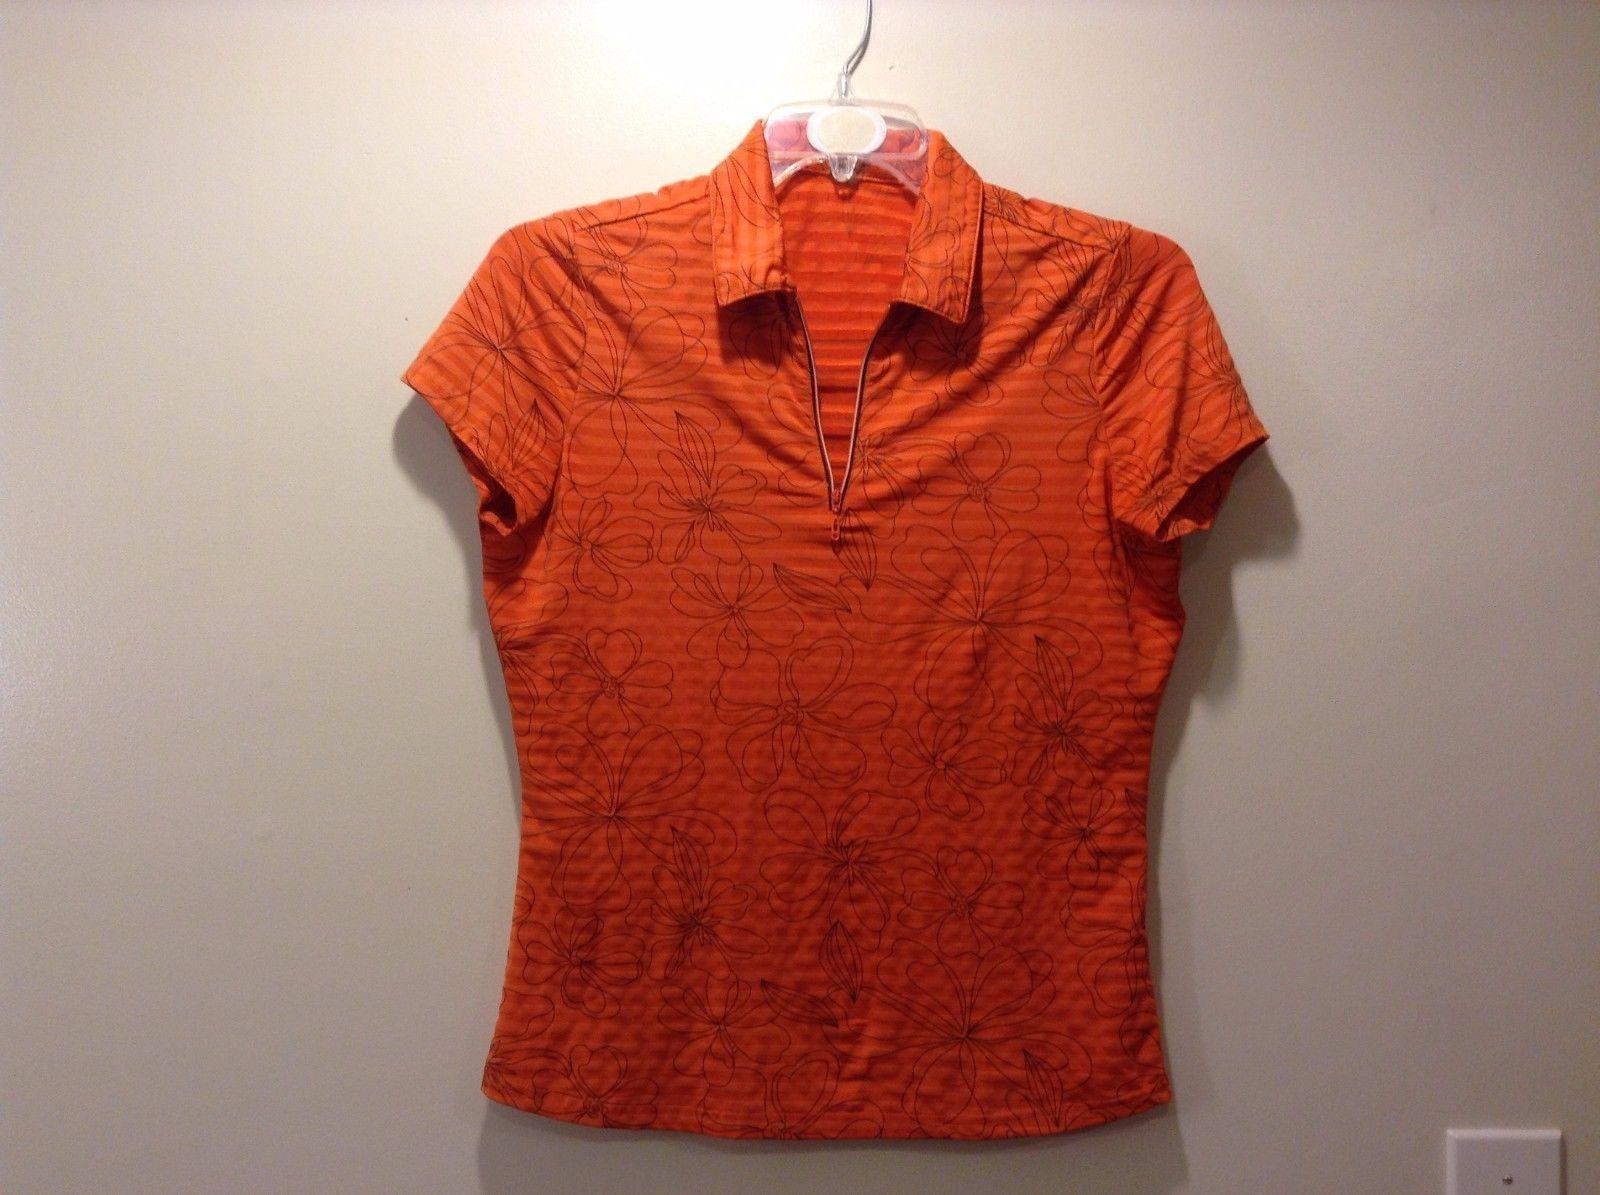 Swing Orange Color Base w Stripe Flower Design Top Sz Medium